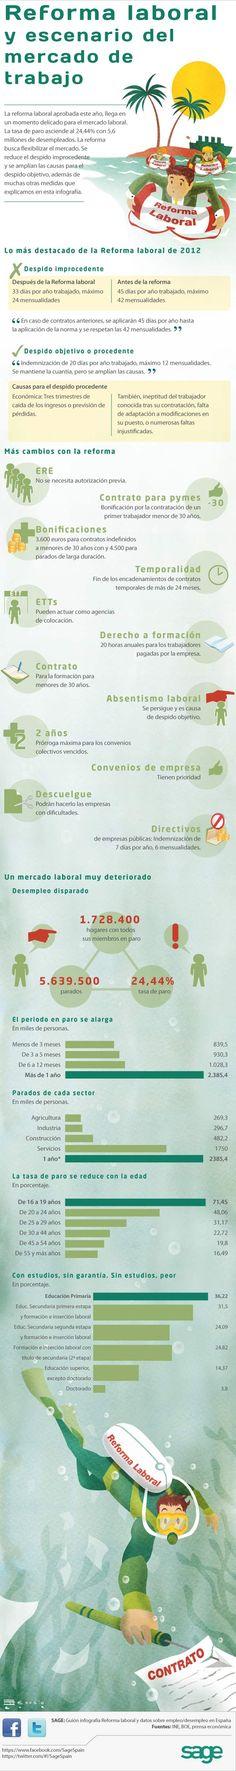 La reforma laboral en España en 2012 #infografia